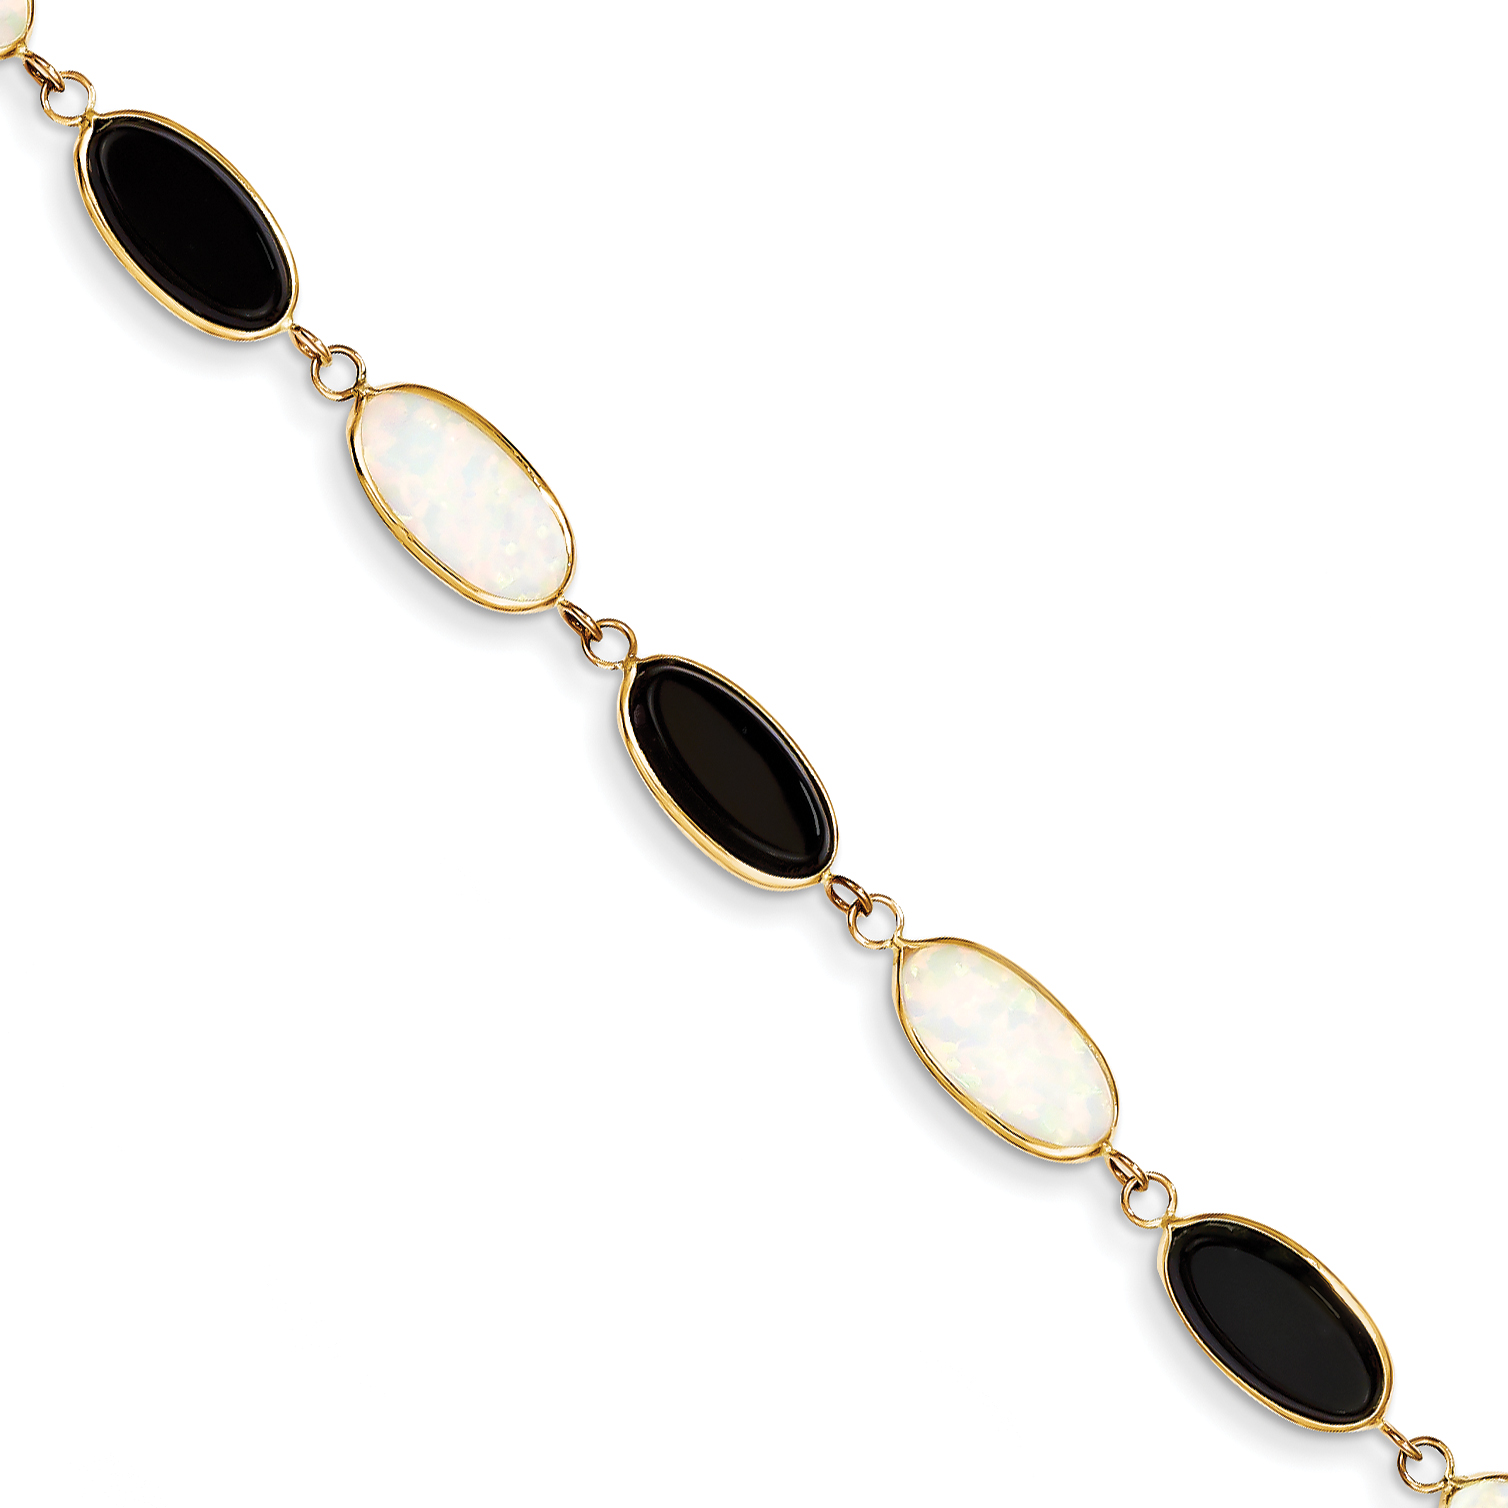 14k 7.5in Onyx & Imitation Opal Bracelet by